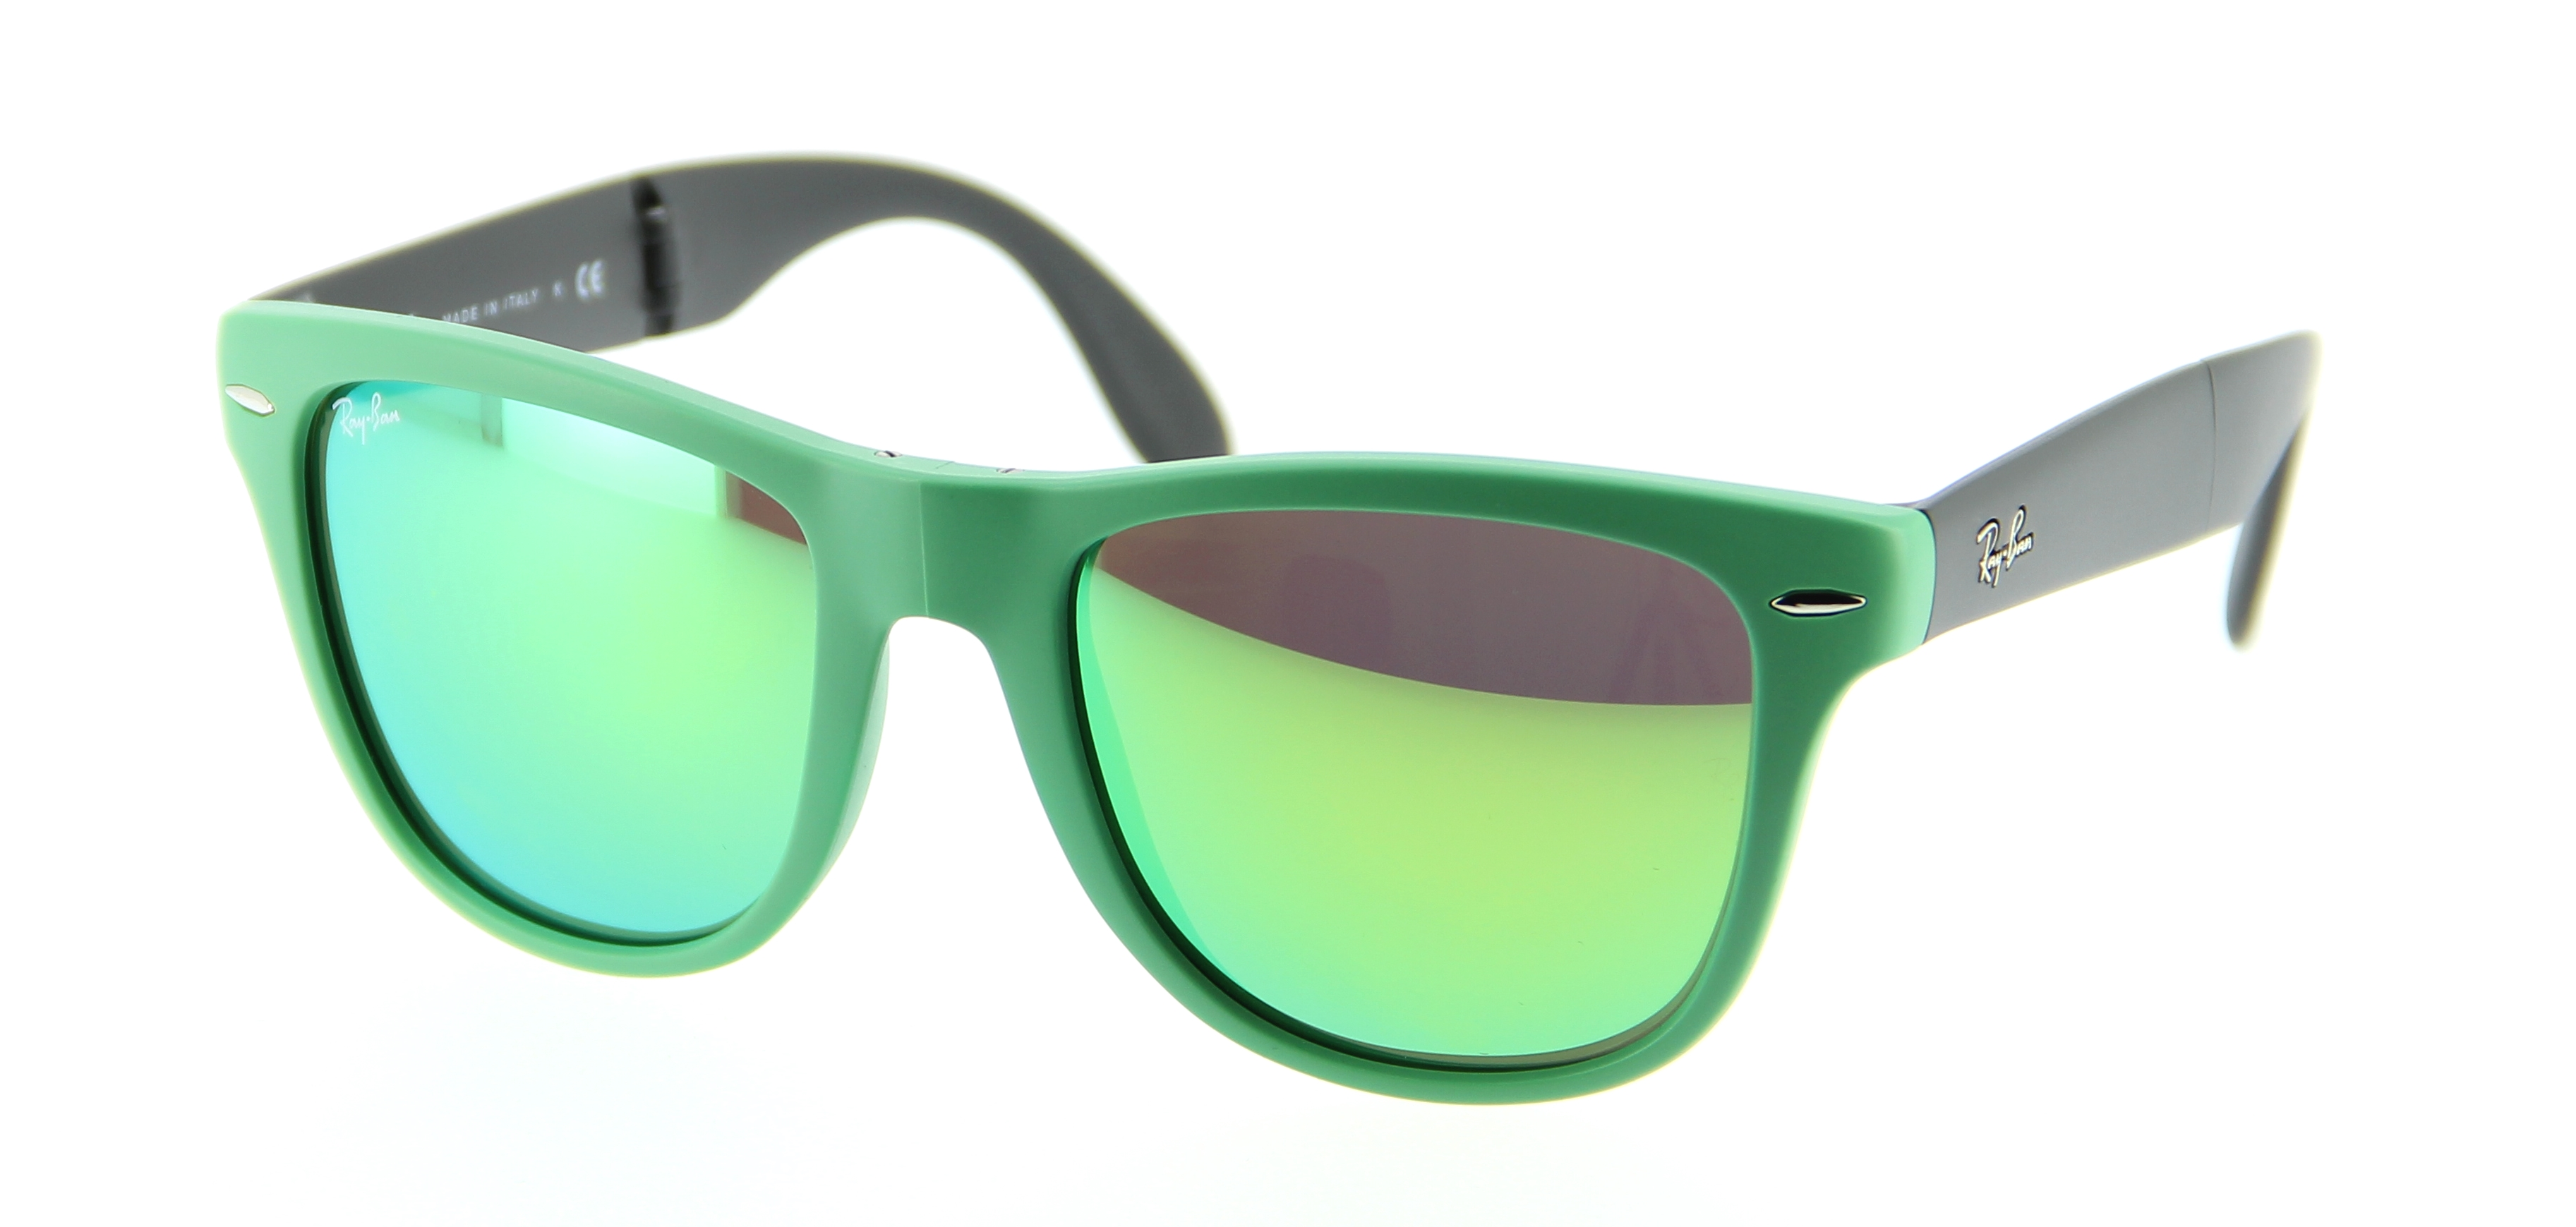 faa8deeff4bac ray ban vert